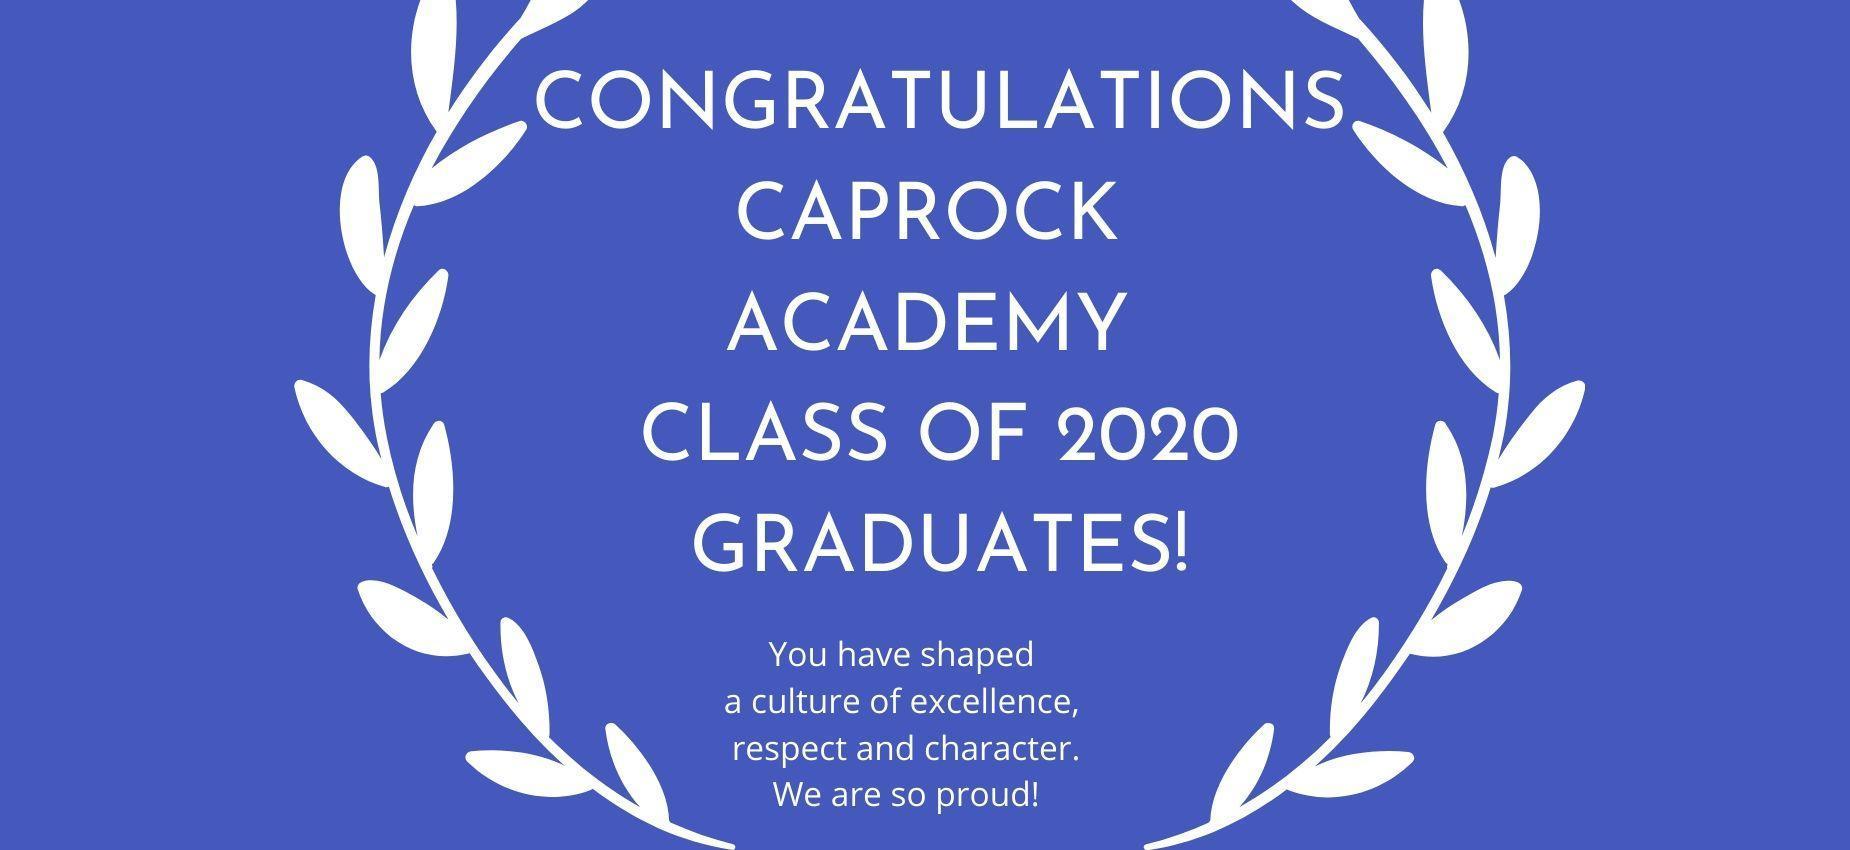 Caprock graduate yard sign